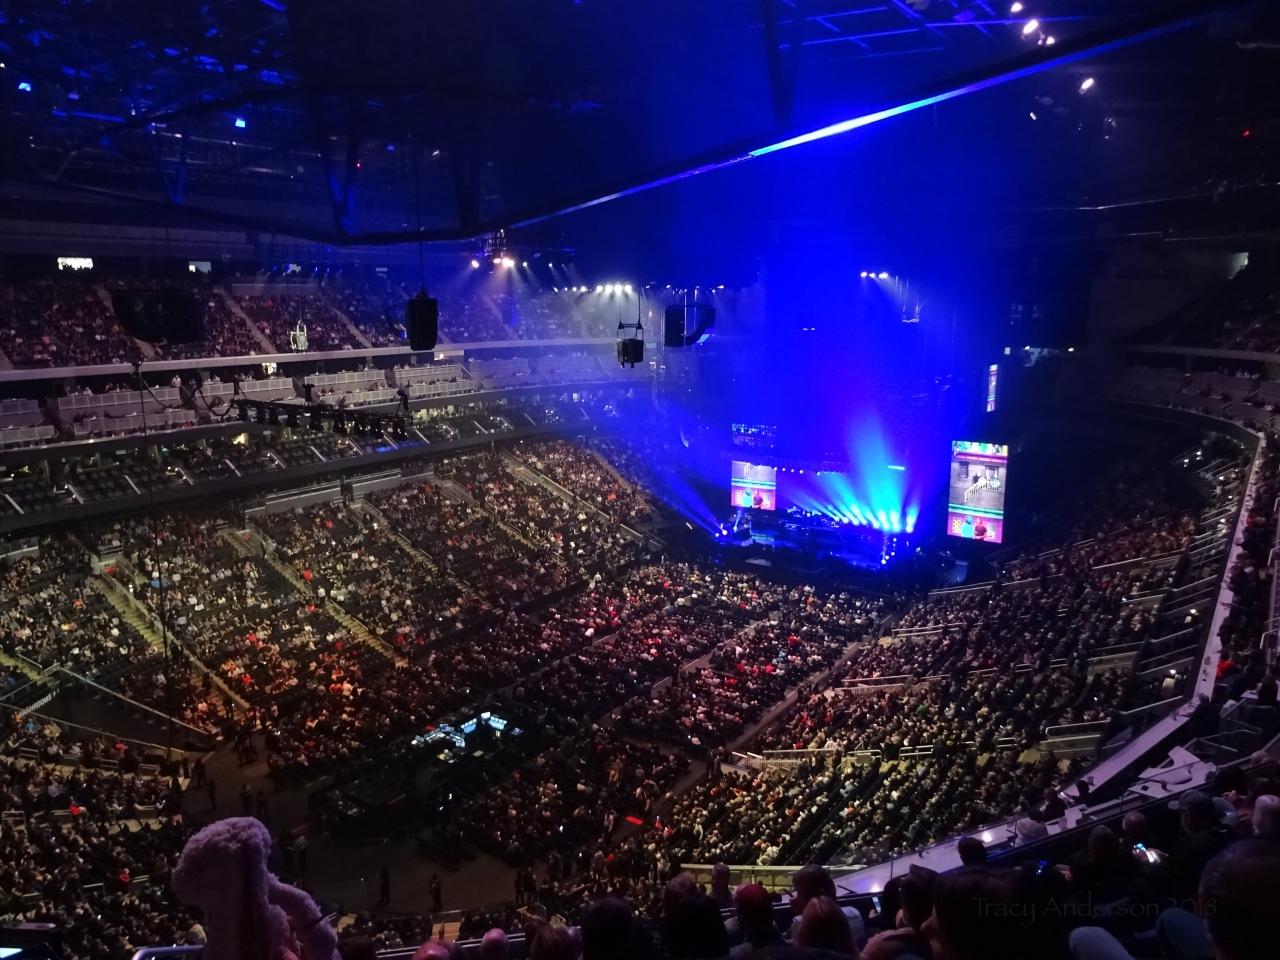 Paul McCartney Freshen Up Tour Rogers Place Sept 30 2018